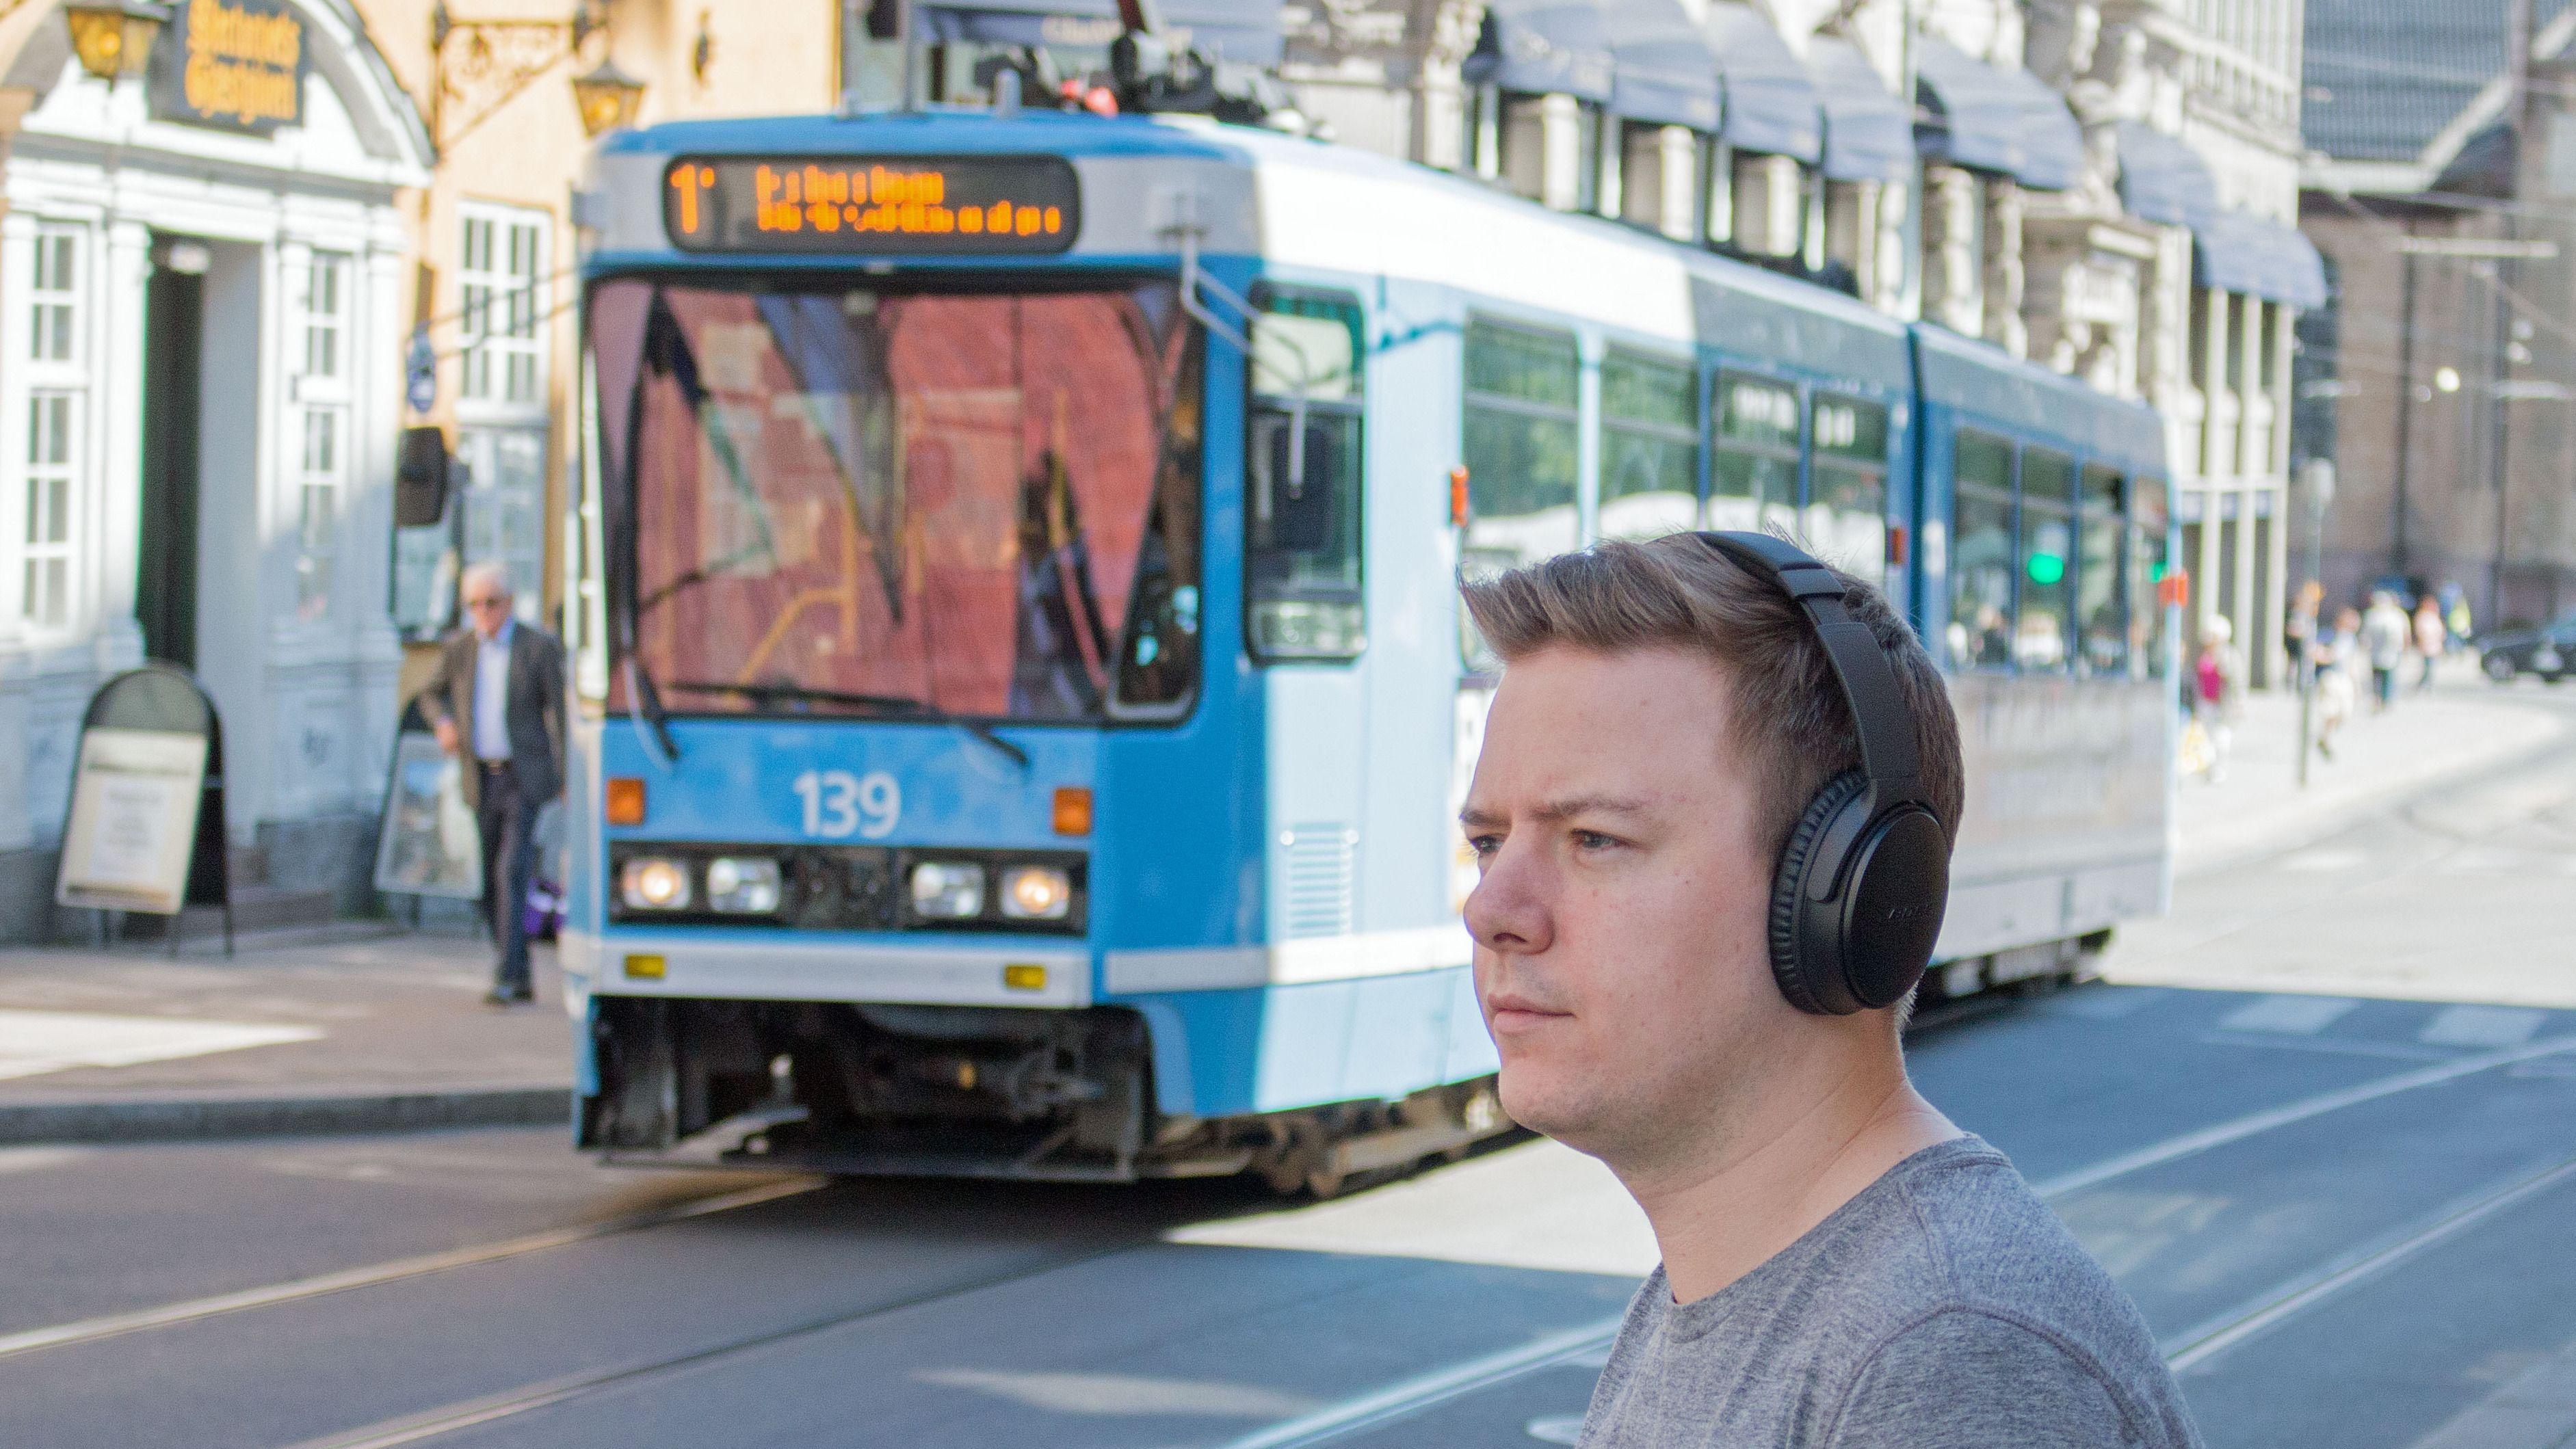 Intet sett, intet hørt! Bilde: Ole Henrik Johansen / Tek.no